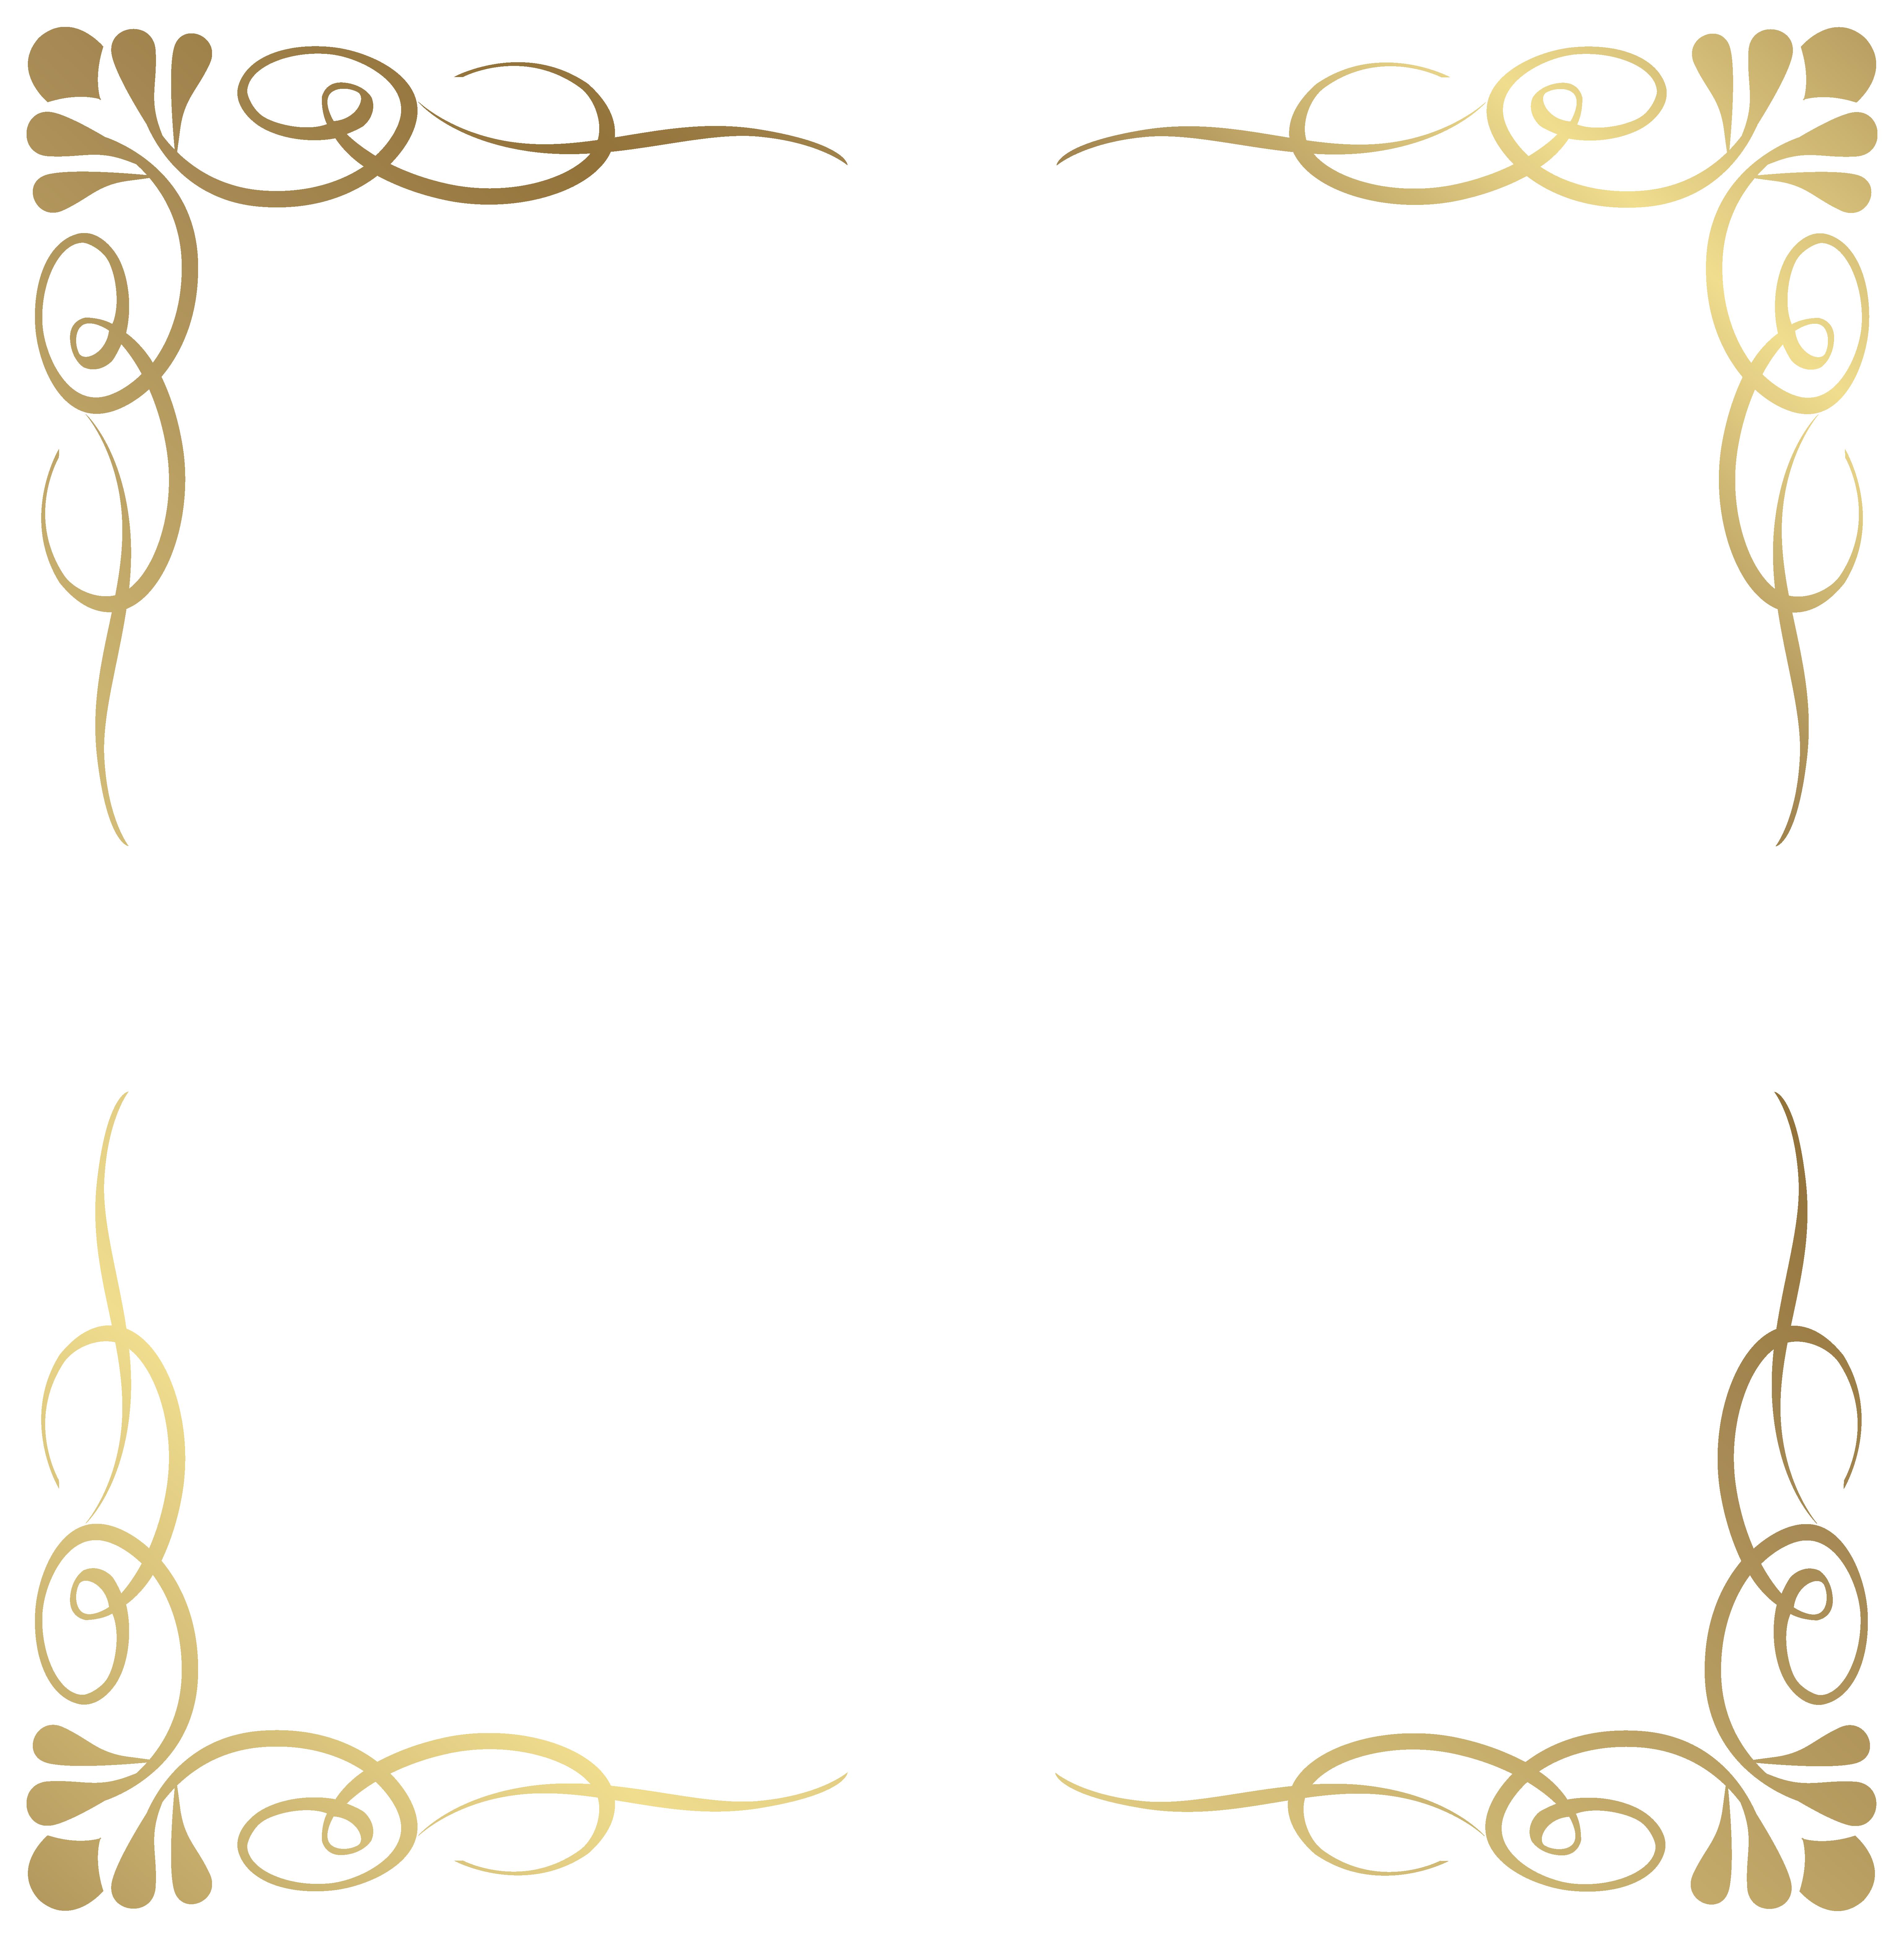 Pendent clipart border Decorative Transparent Image Frame Border